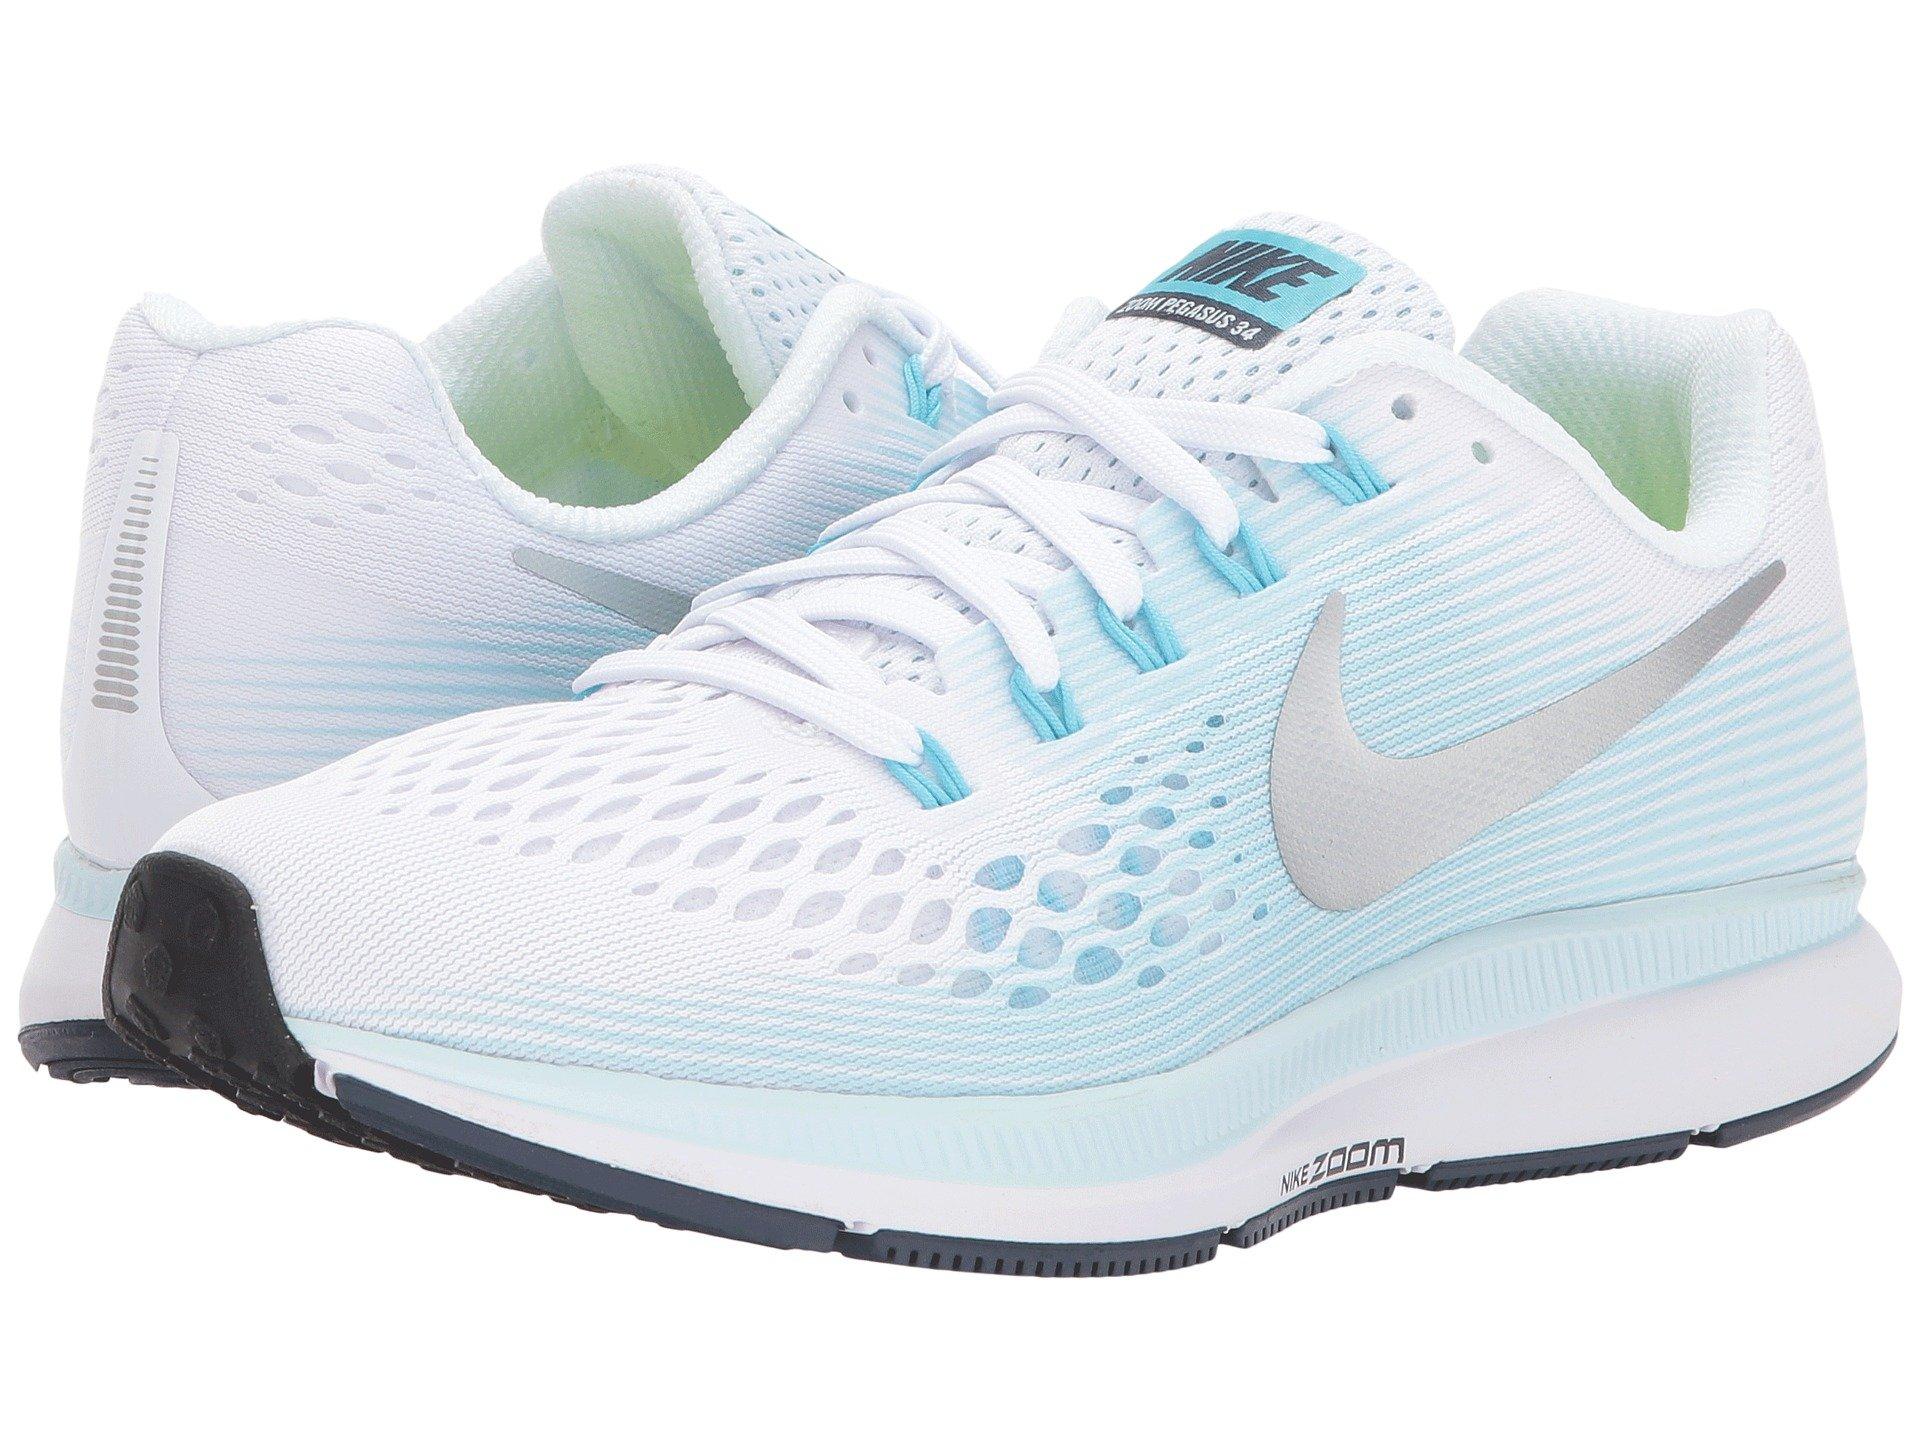 e6c0390548ff Nike Dunk Sb Momofuku Kyrie 5 Shoes